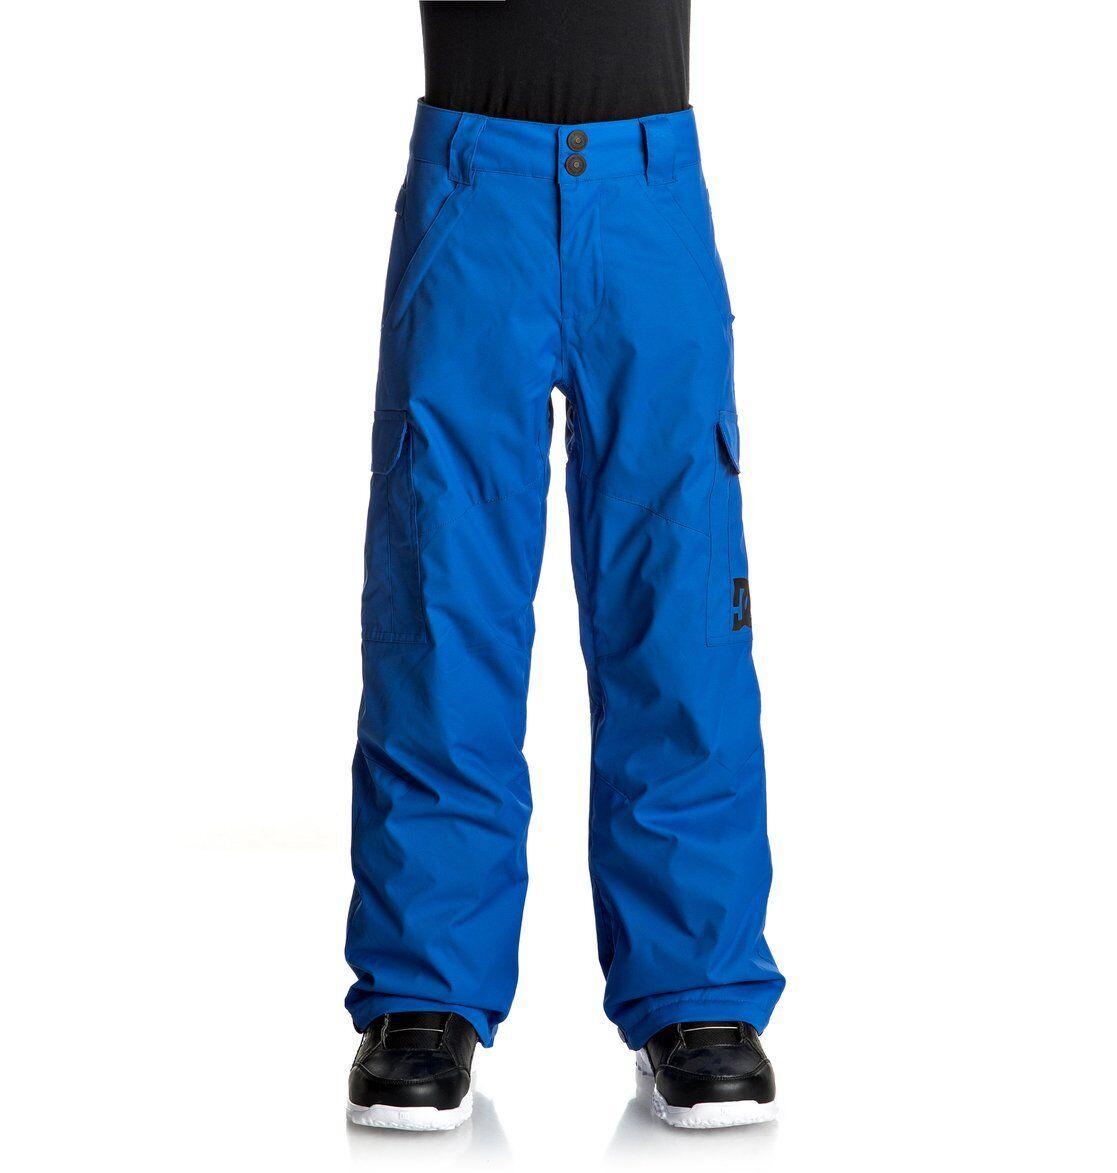 DC Boy's BANSHEE Snow Pants - BQR0 - Large - NWT